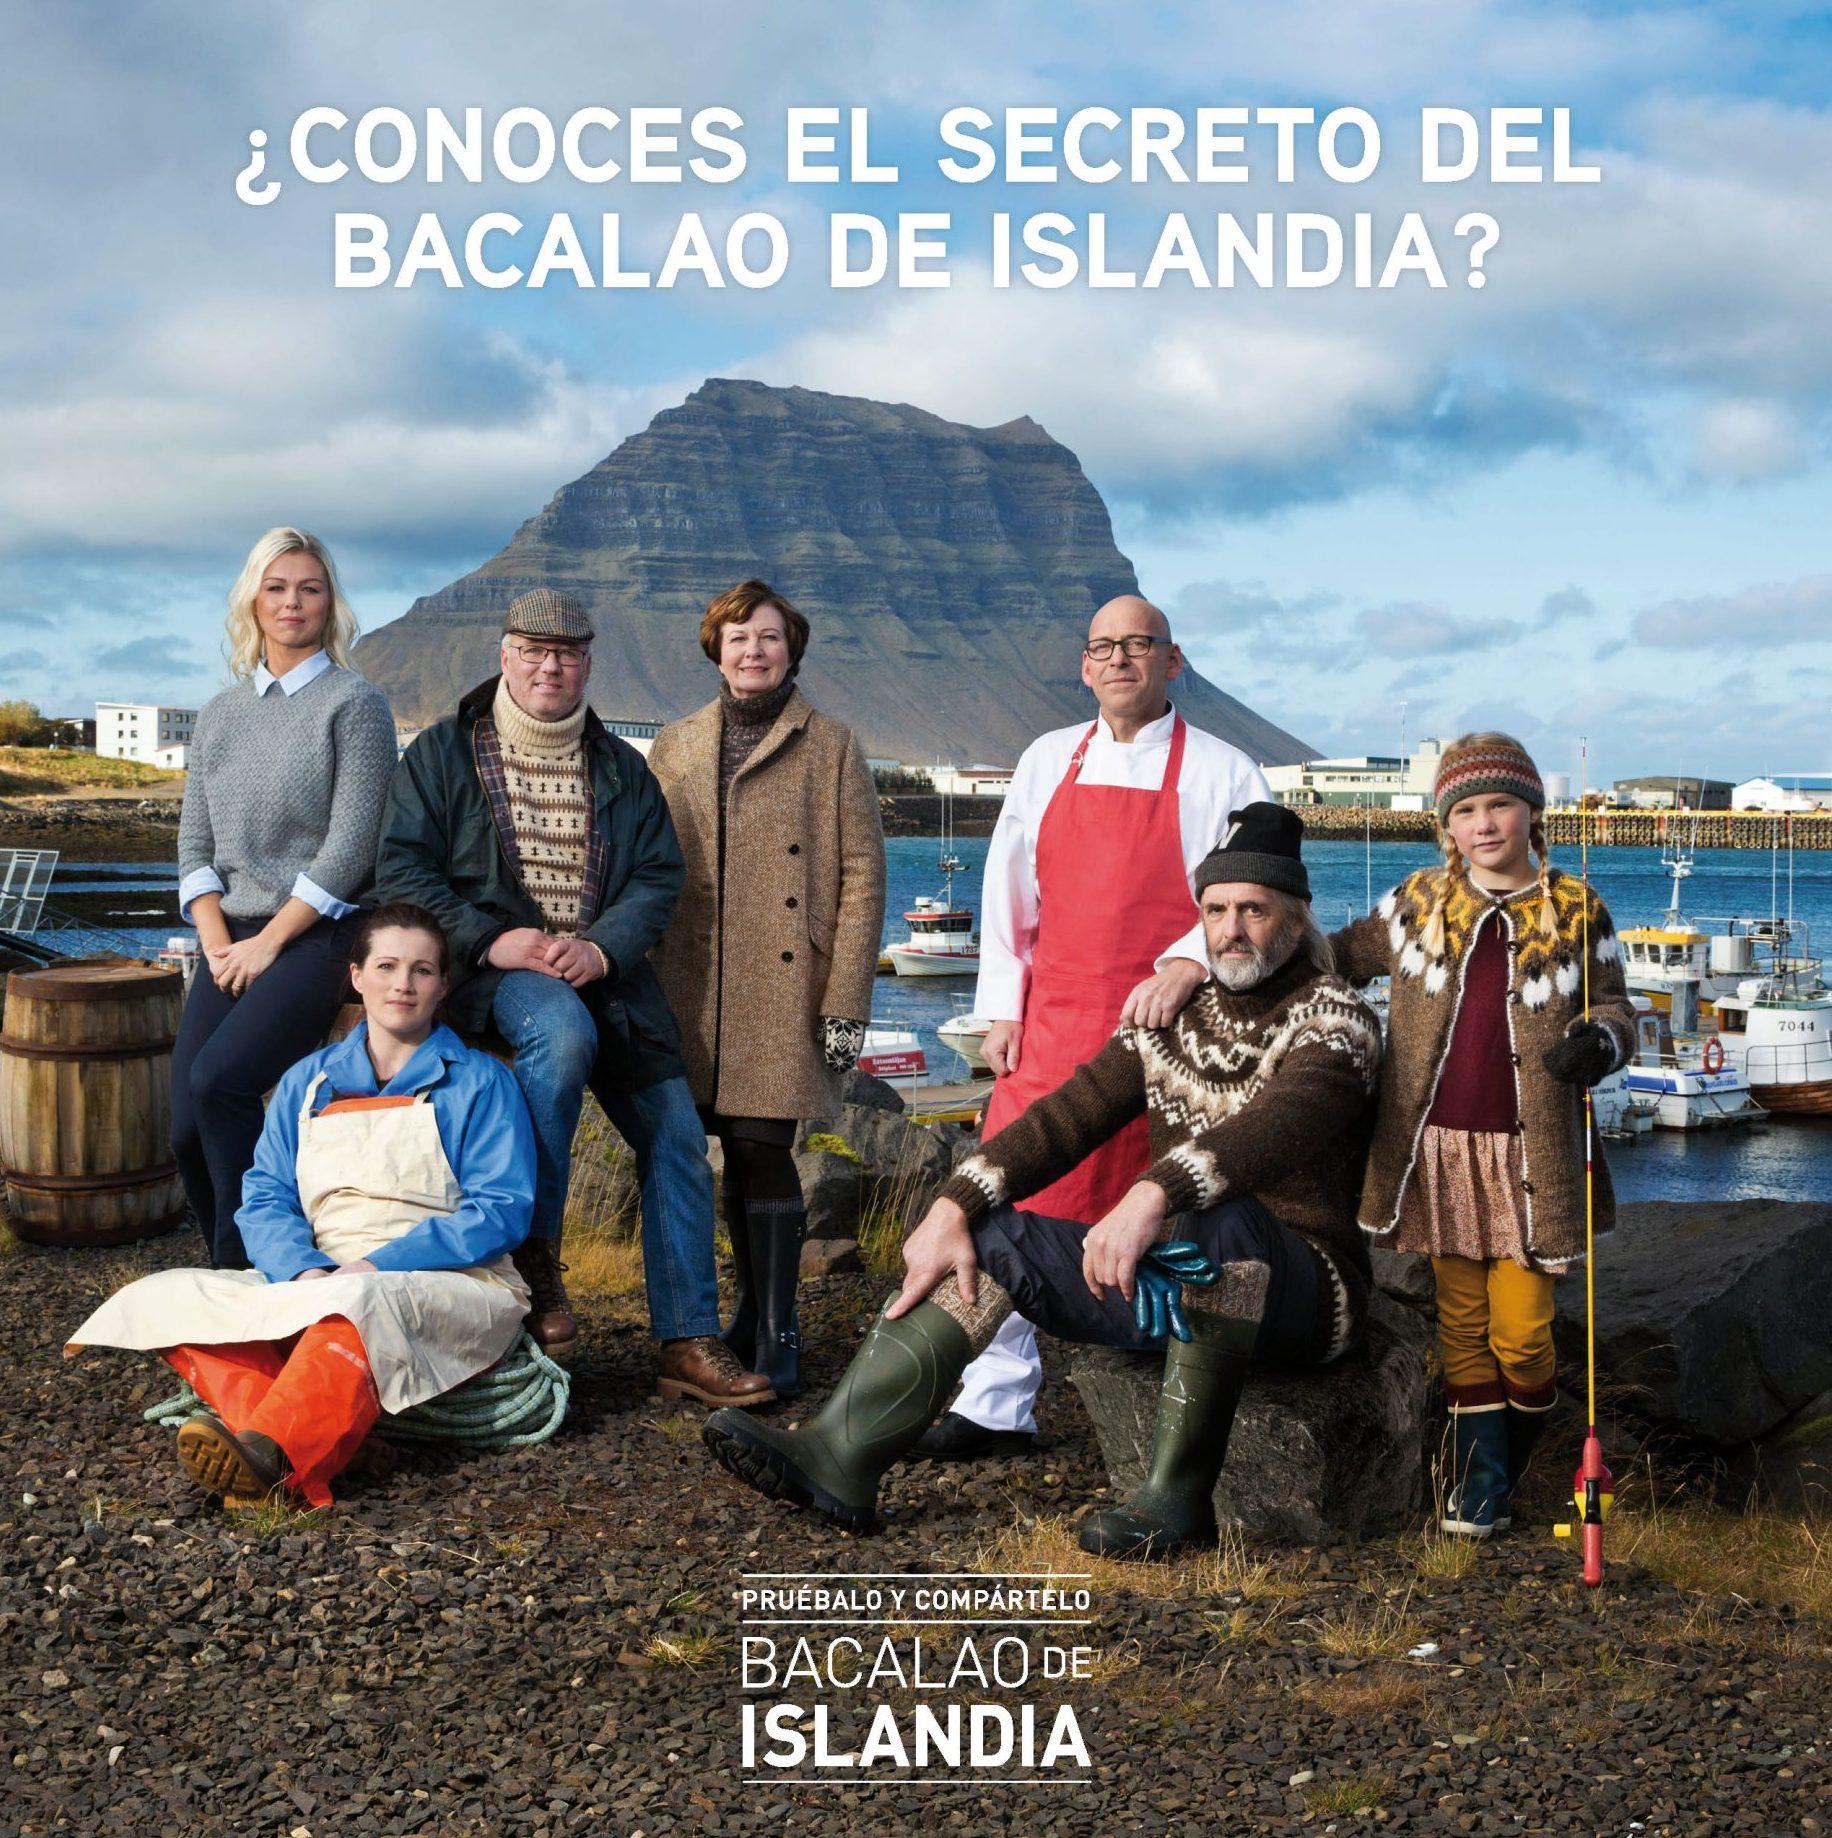 BACALAO DE ISLANDIA